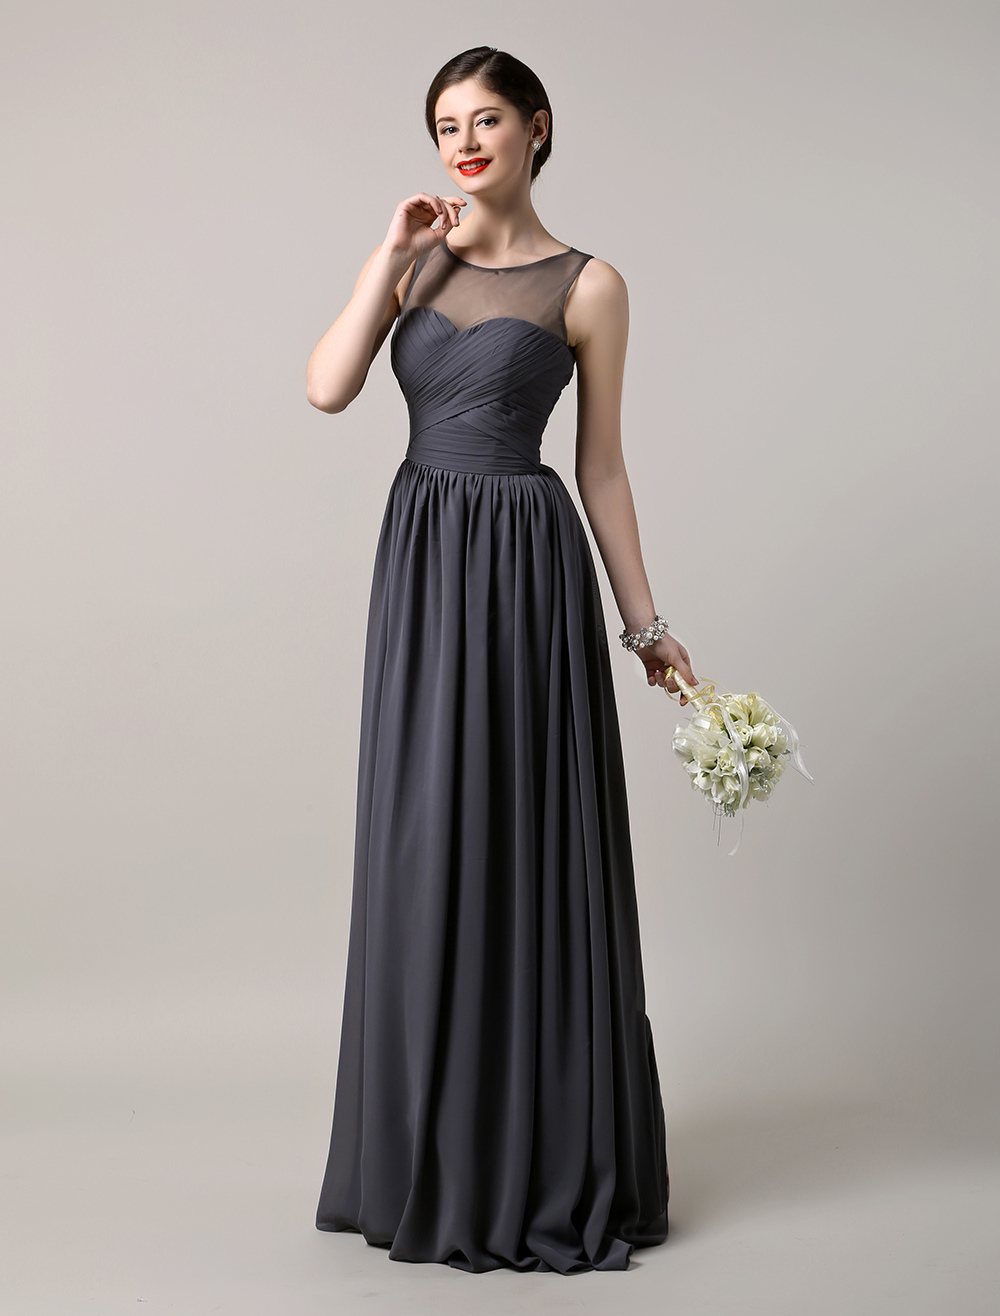 Chiffon Floor Length Sheer Sleeveless Bateau Bridesmaid Gown